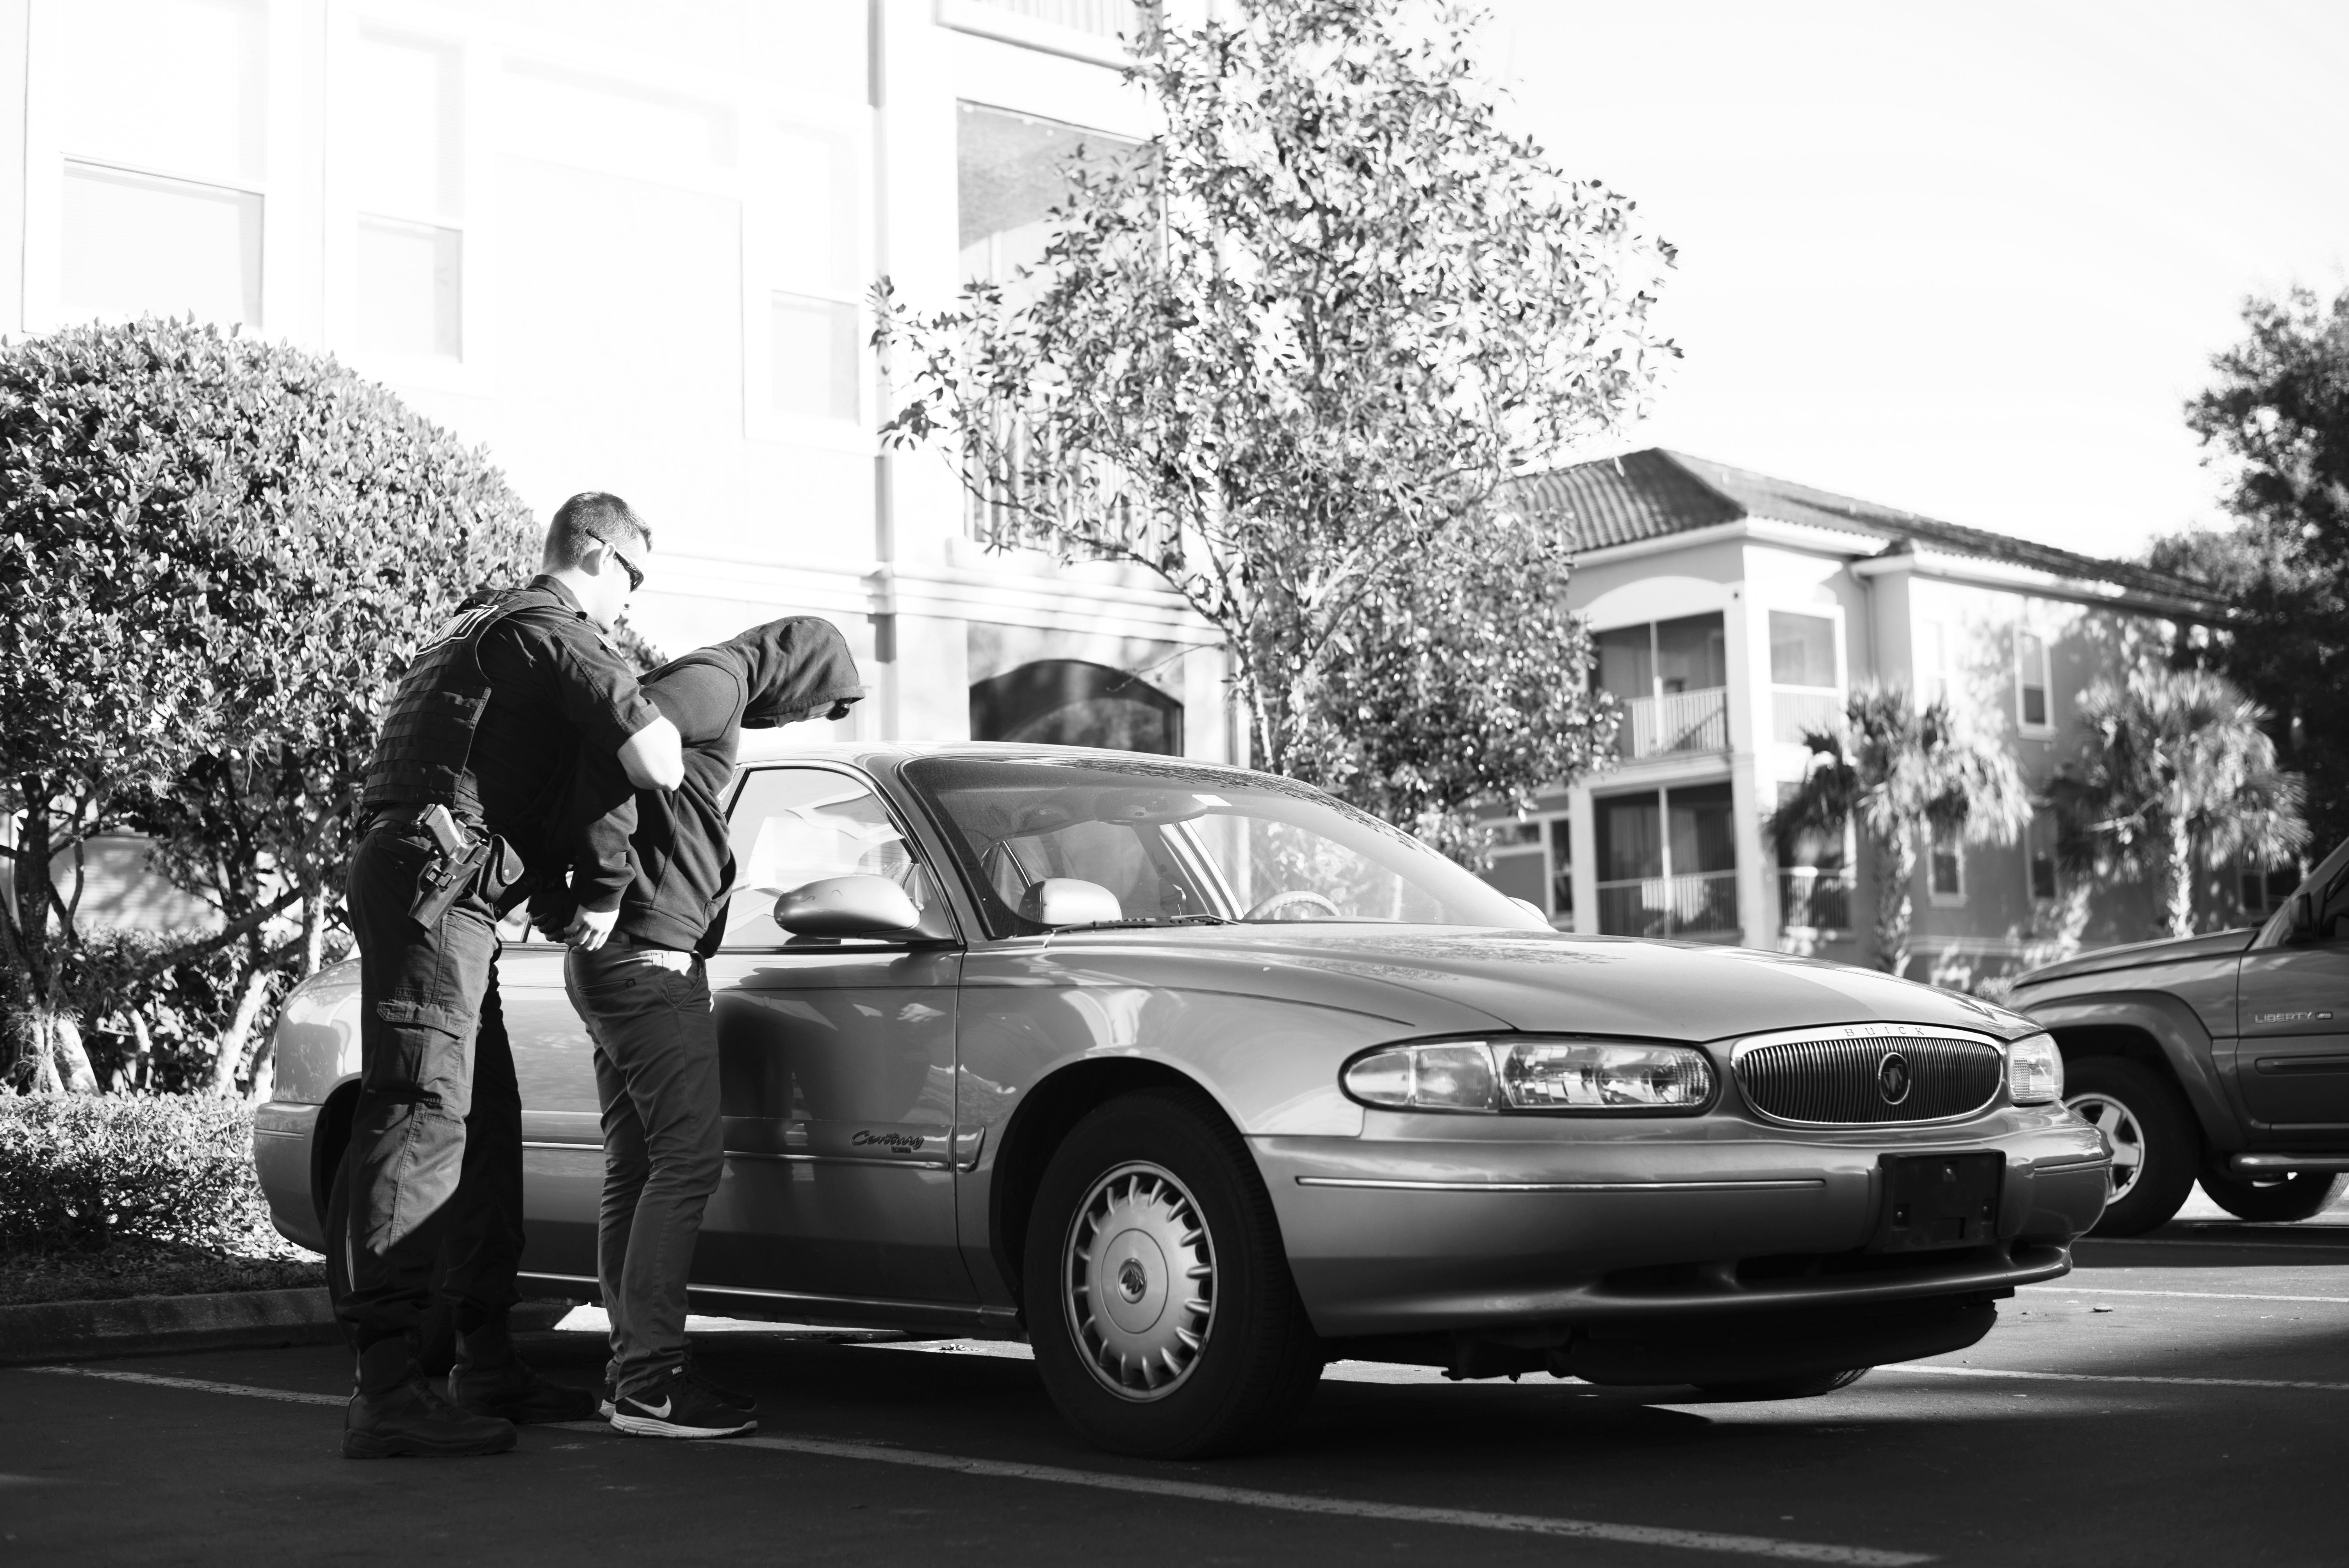 Security guard apprehending a criminal